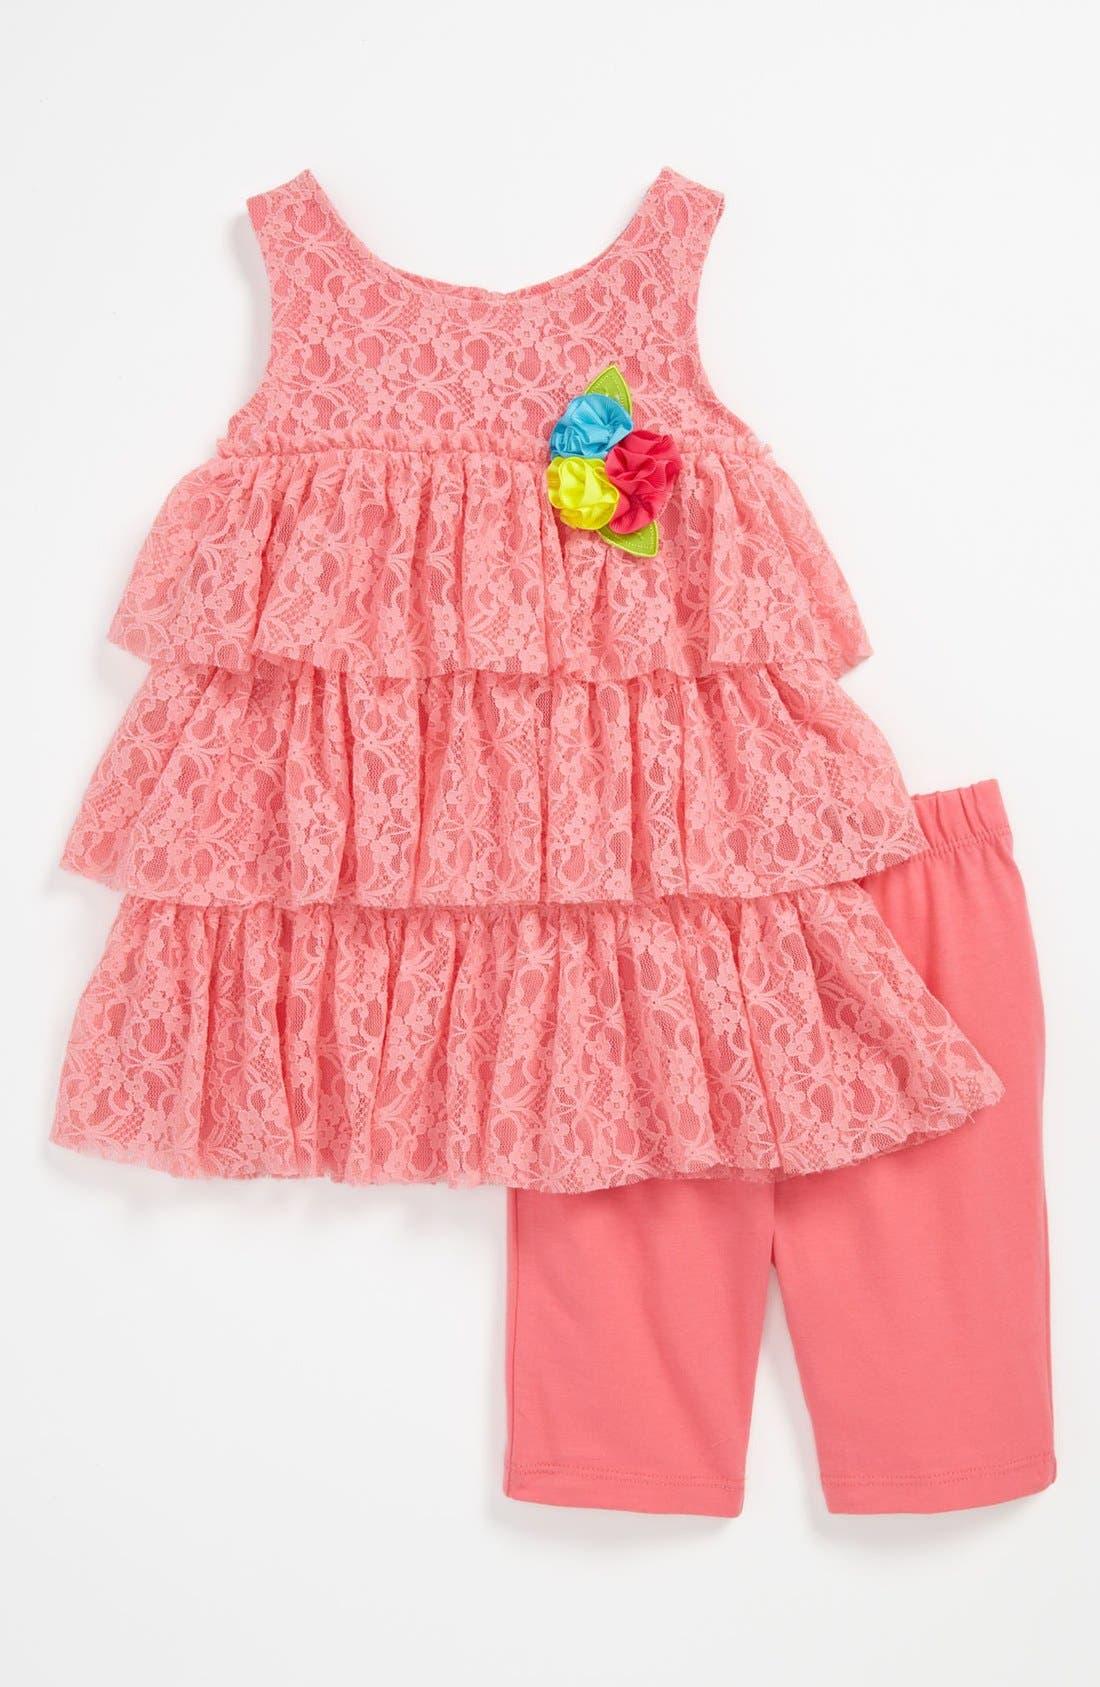 Alternate Image 1 Selected - Sweet Heart Rose Dress & Leggings (Baby)